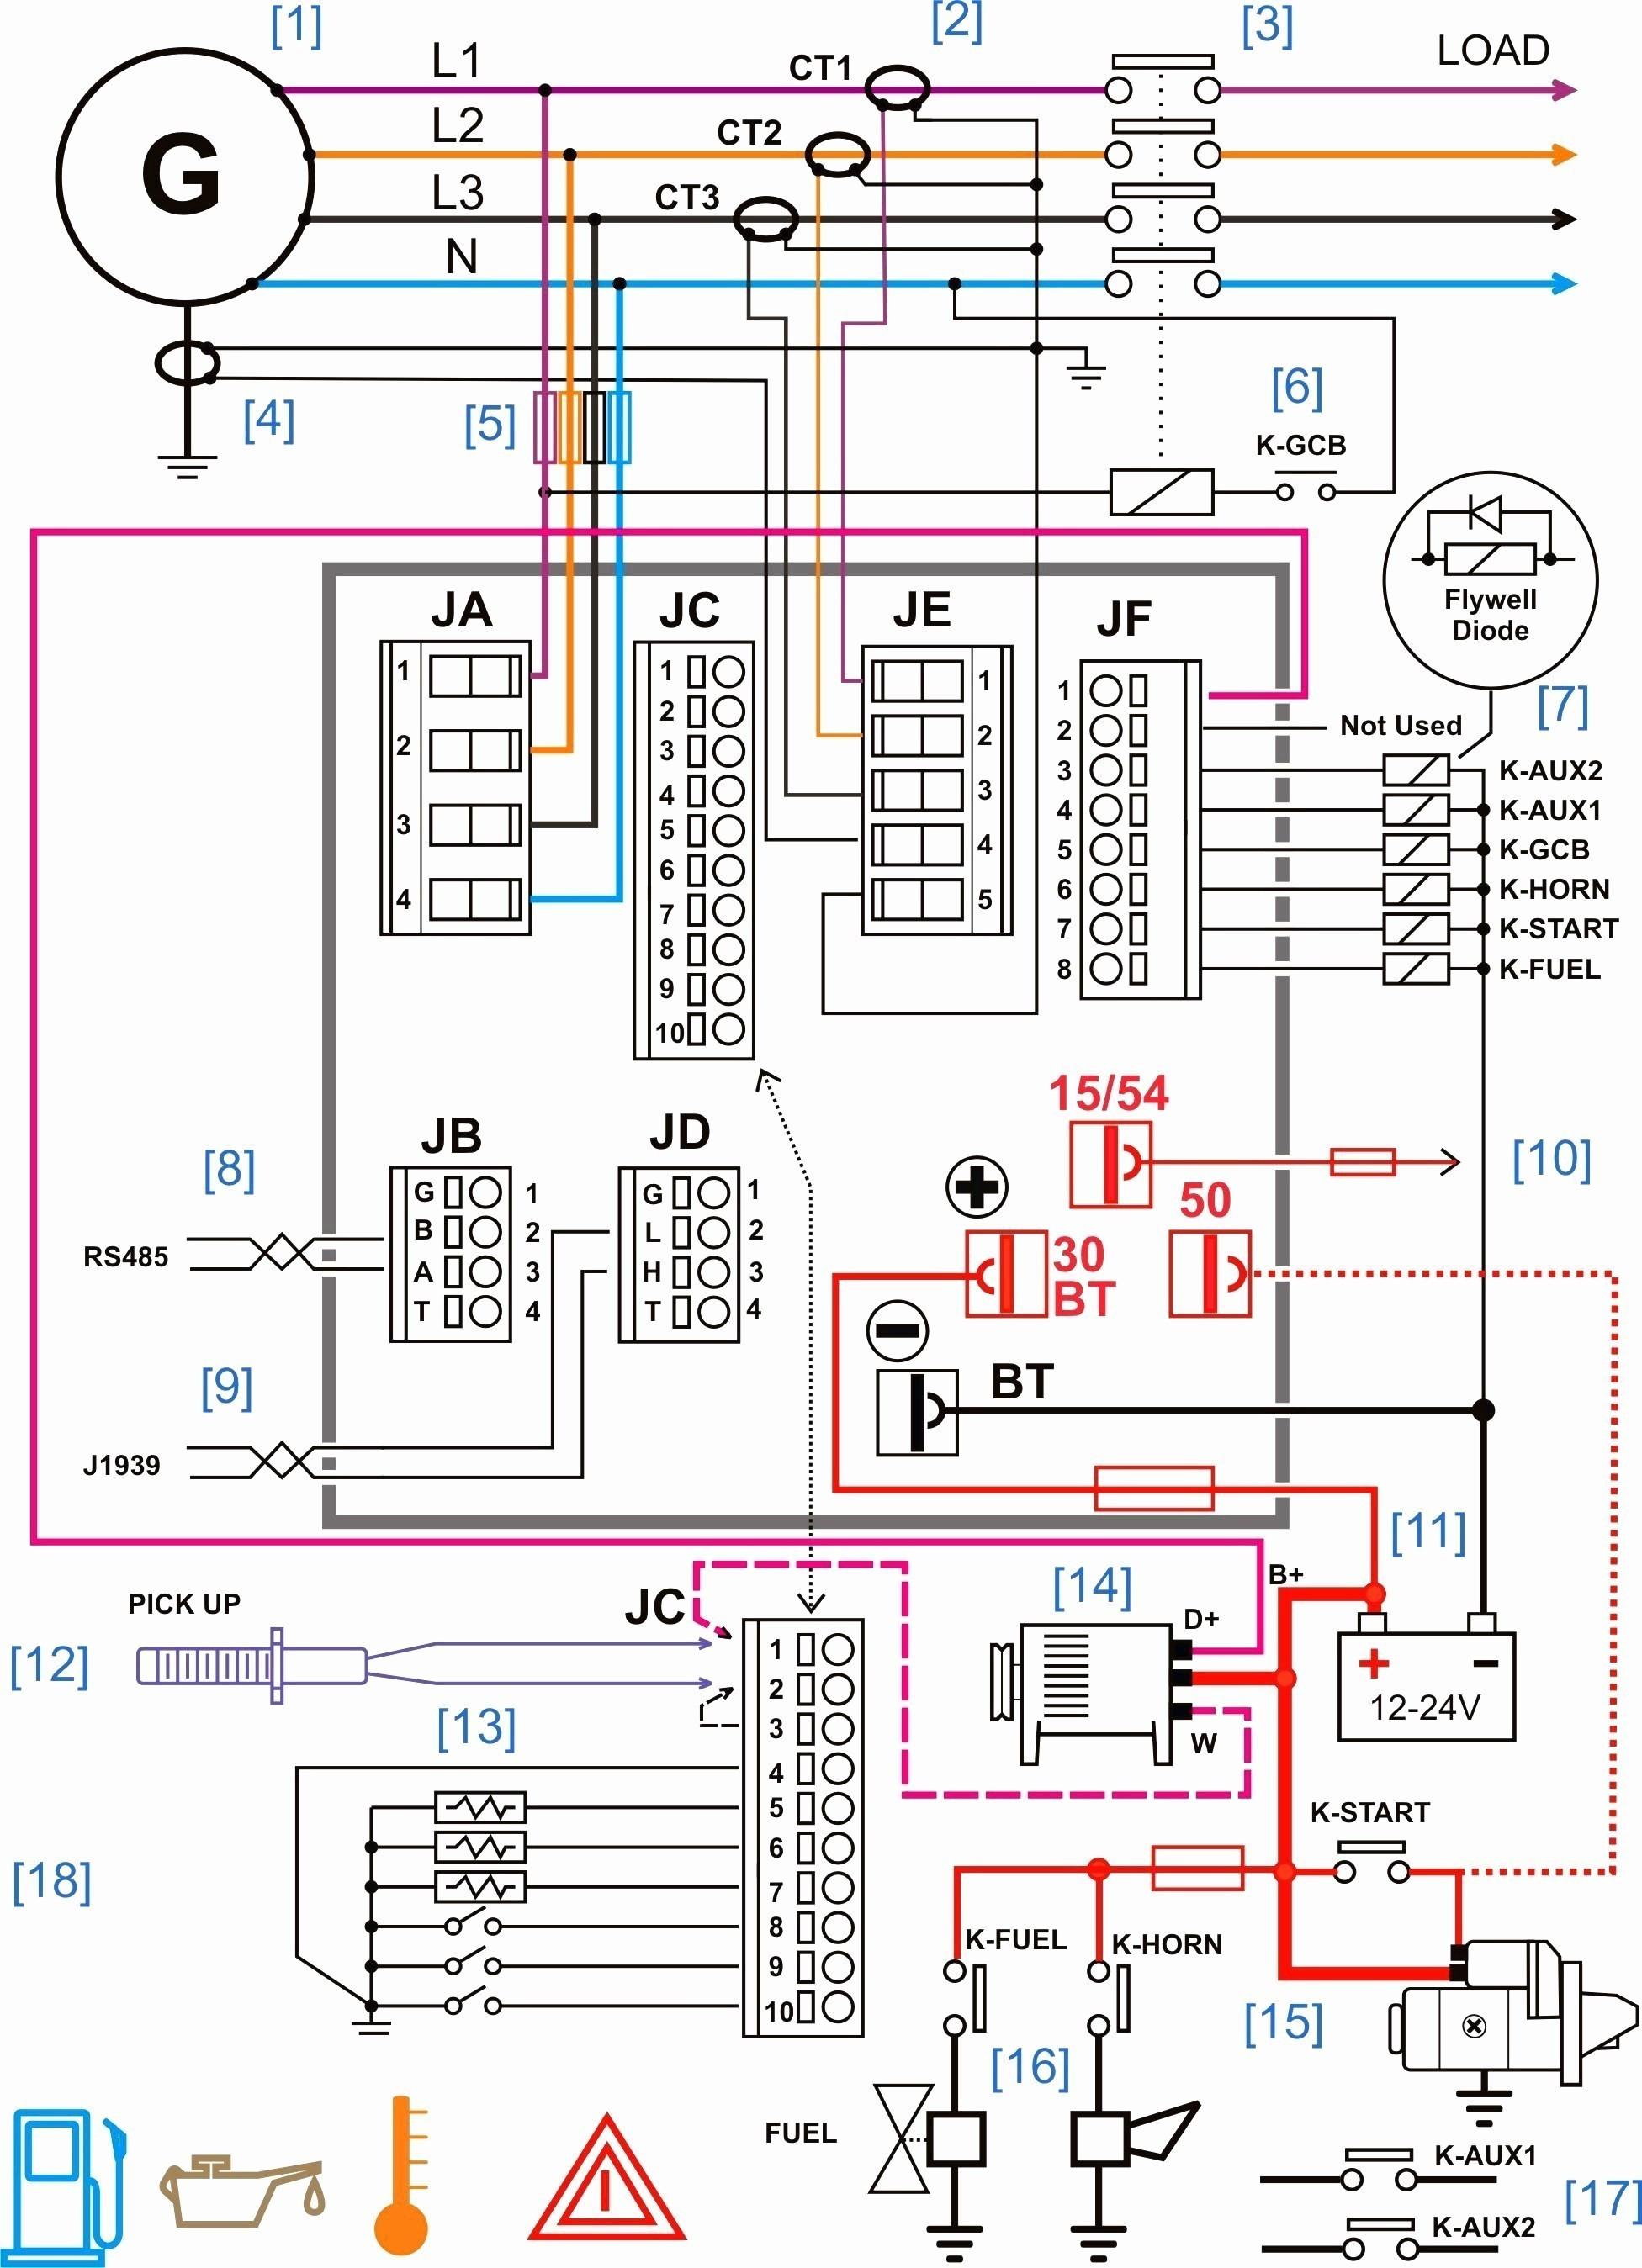 Car Powertrain Diagram Save Audi A4 Cd Player Wiring Diagram Of Car Powertrain Diagram